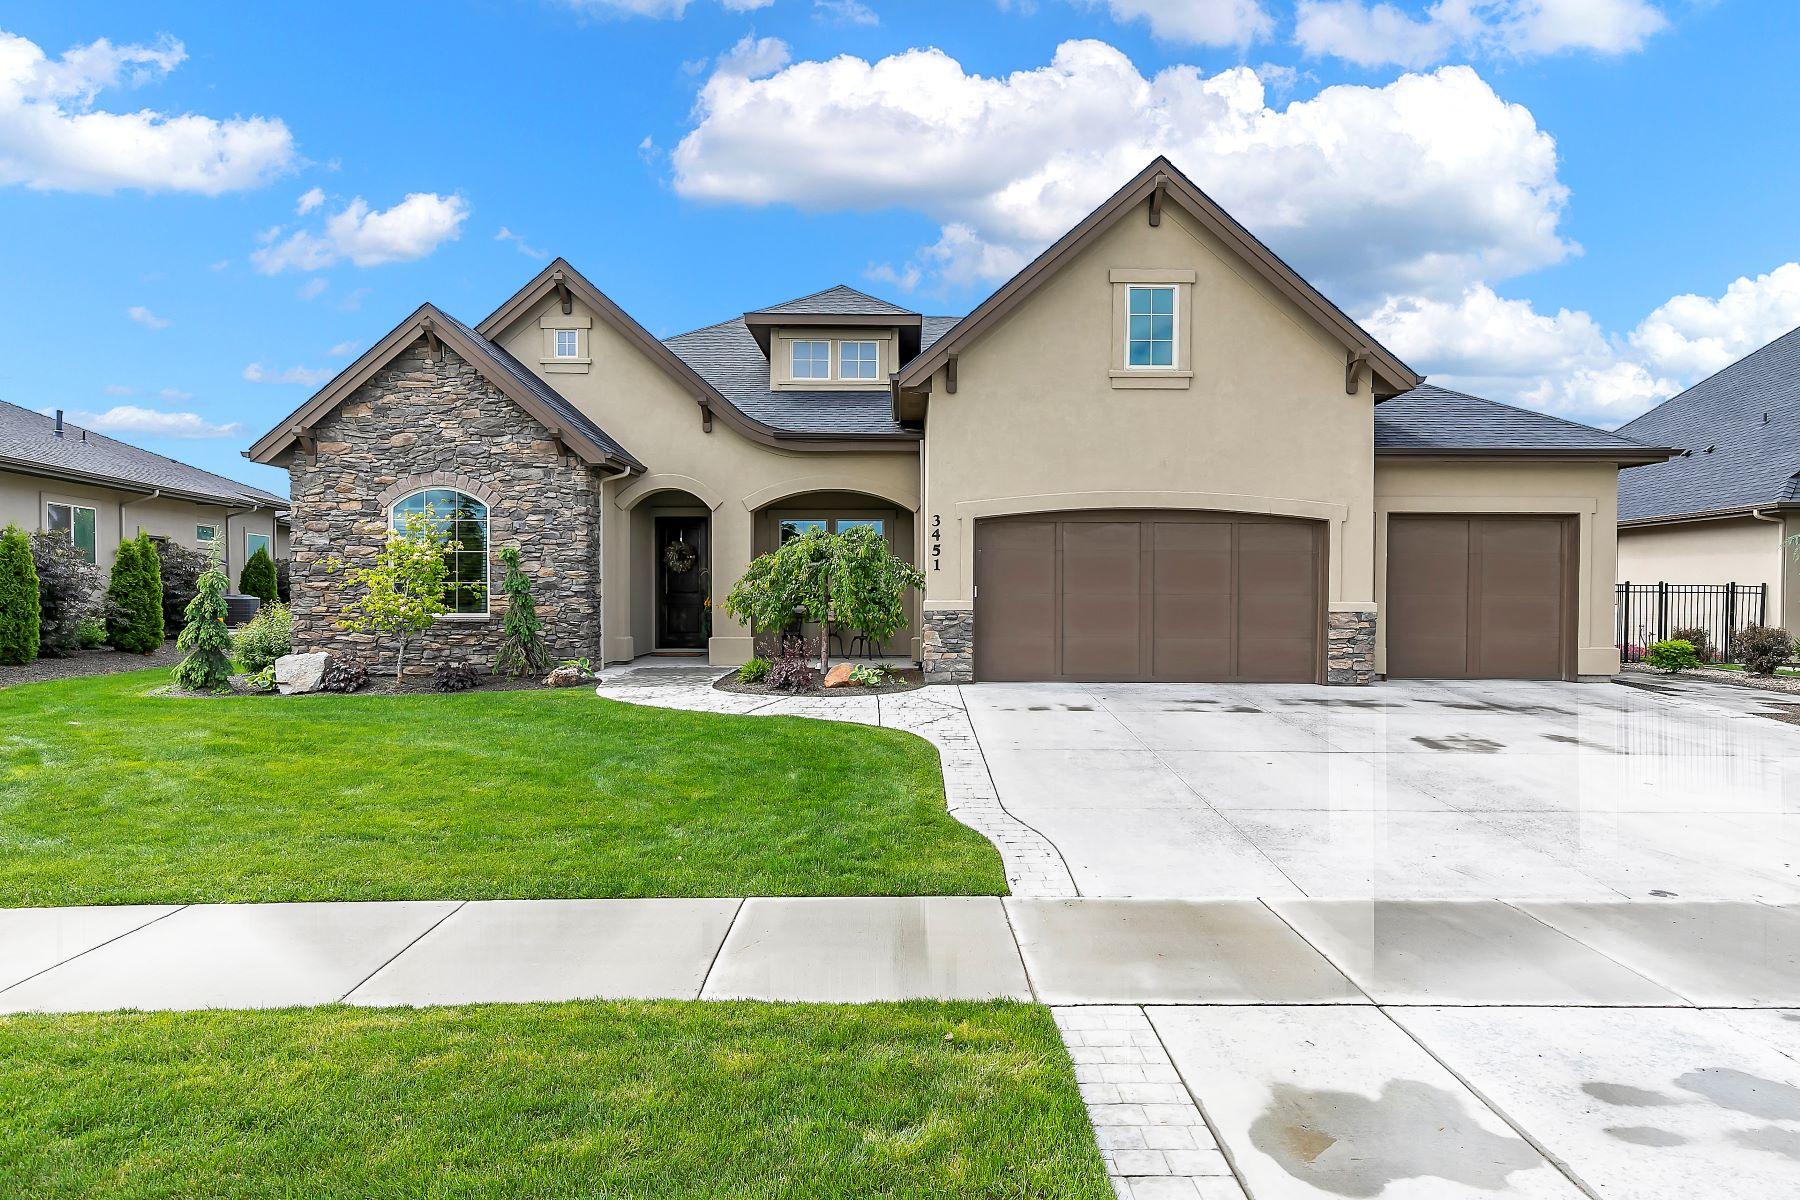 Single Family Home for Active at 3451 Dublin Street, Eagle 3451 W Dublin St Eagle, Idaho 83616 United States